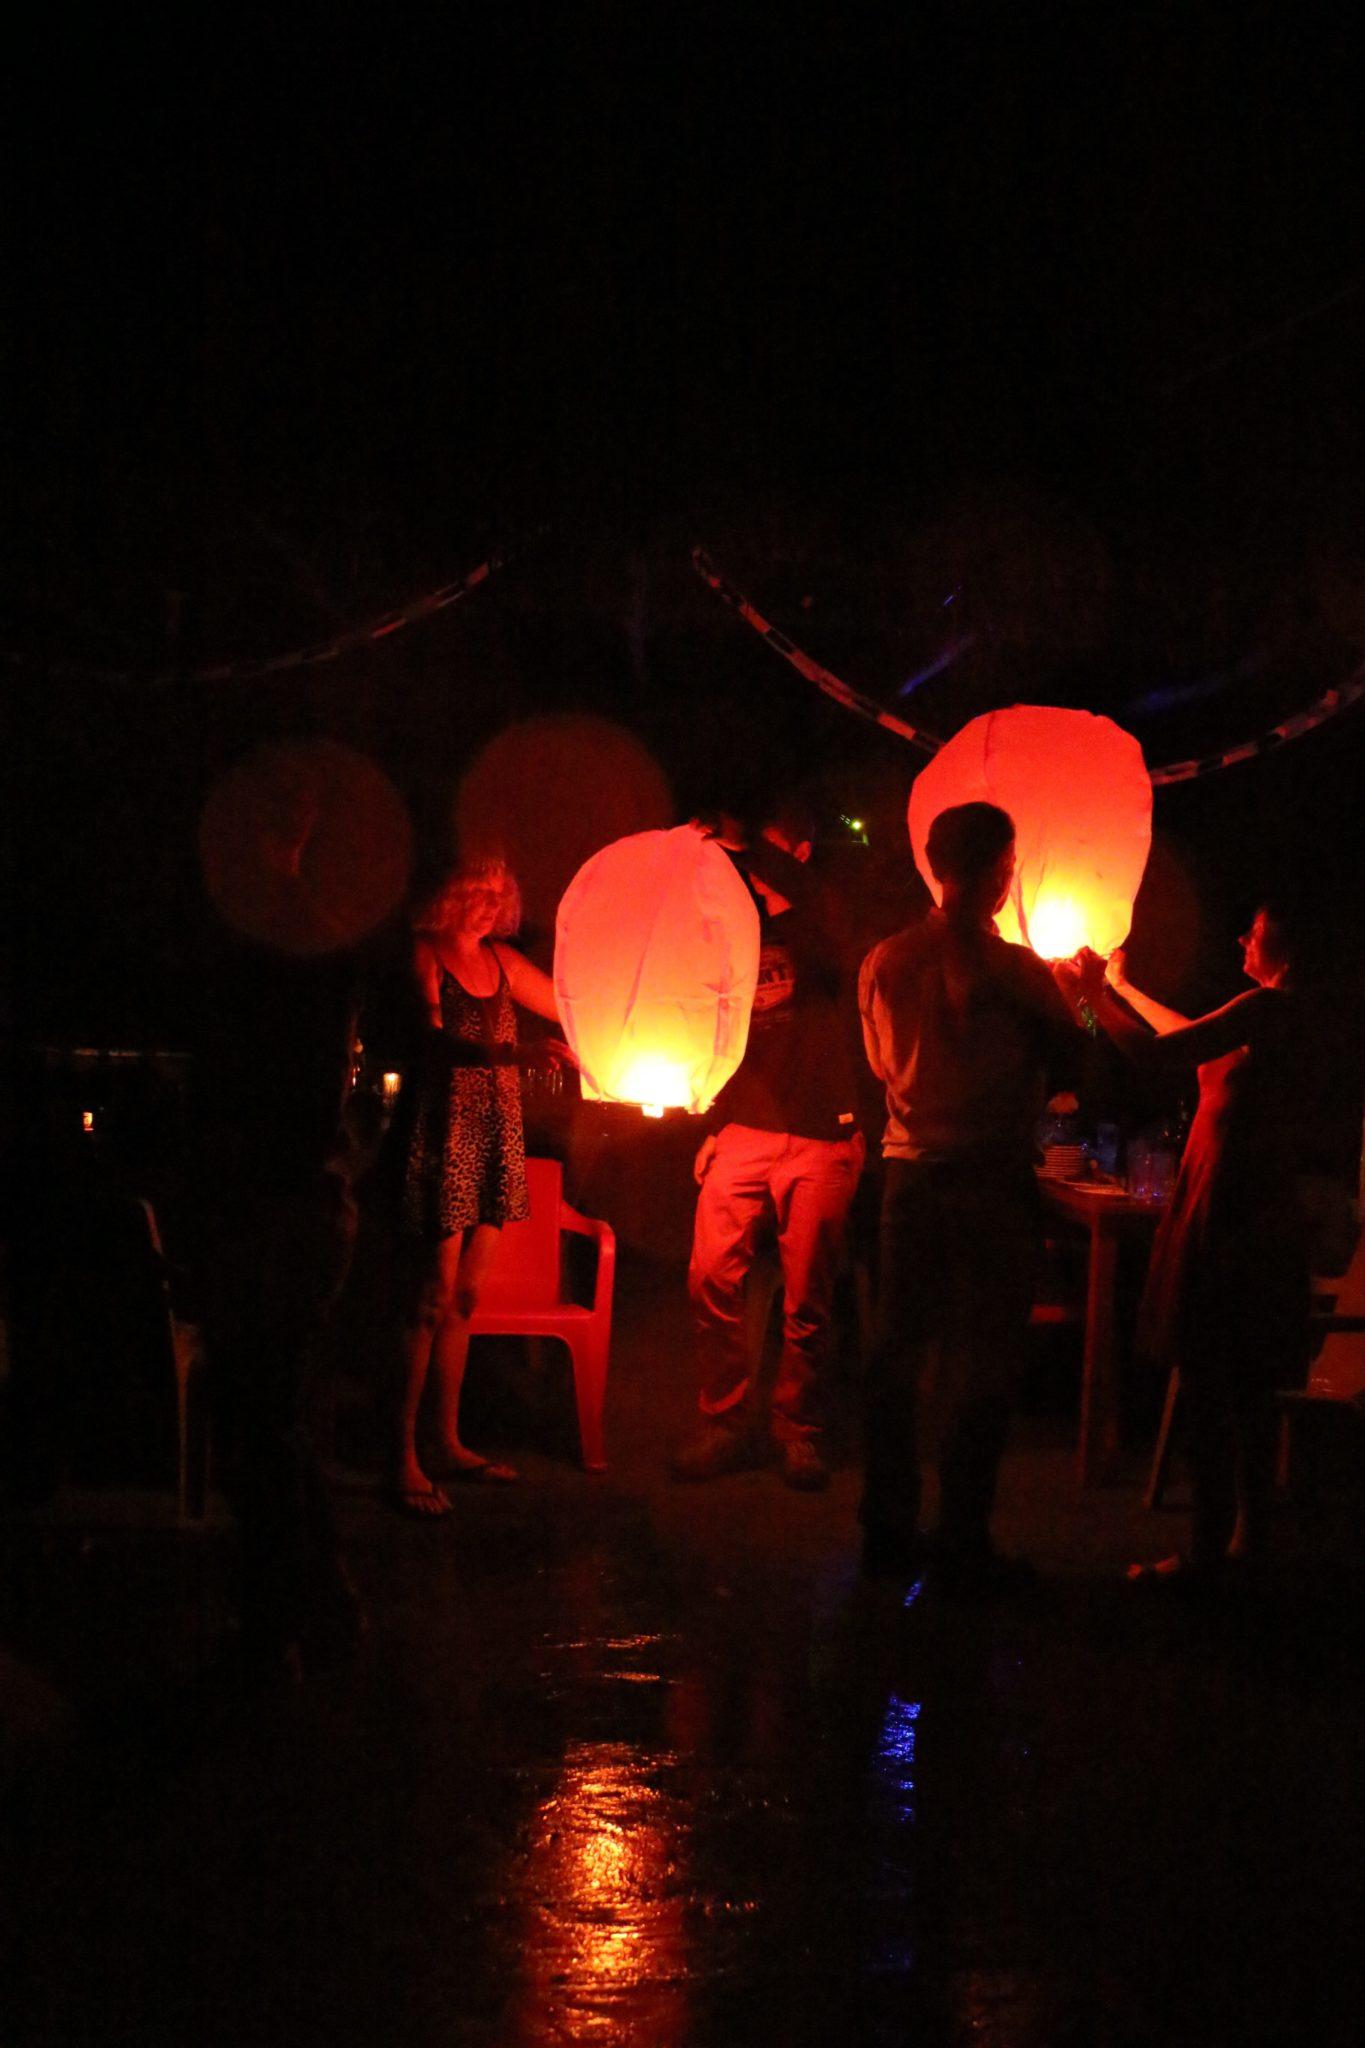 Lighting the lanterns